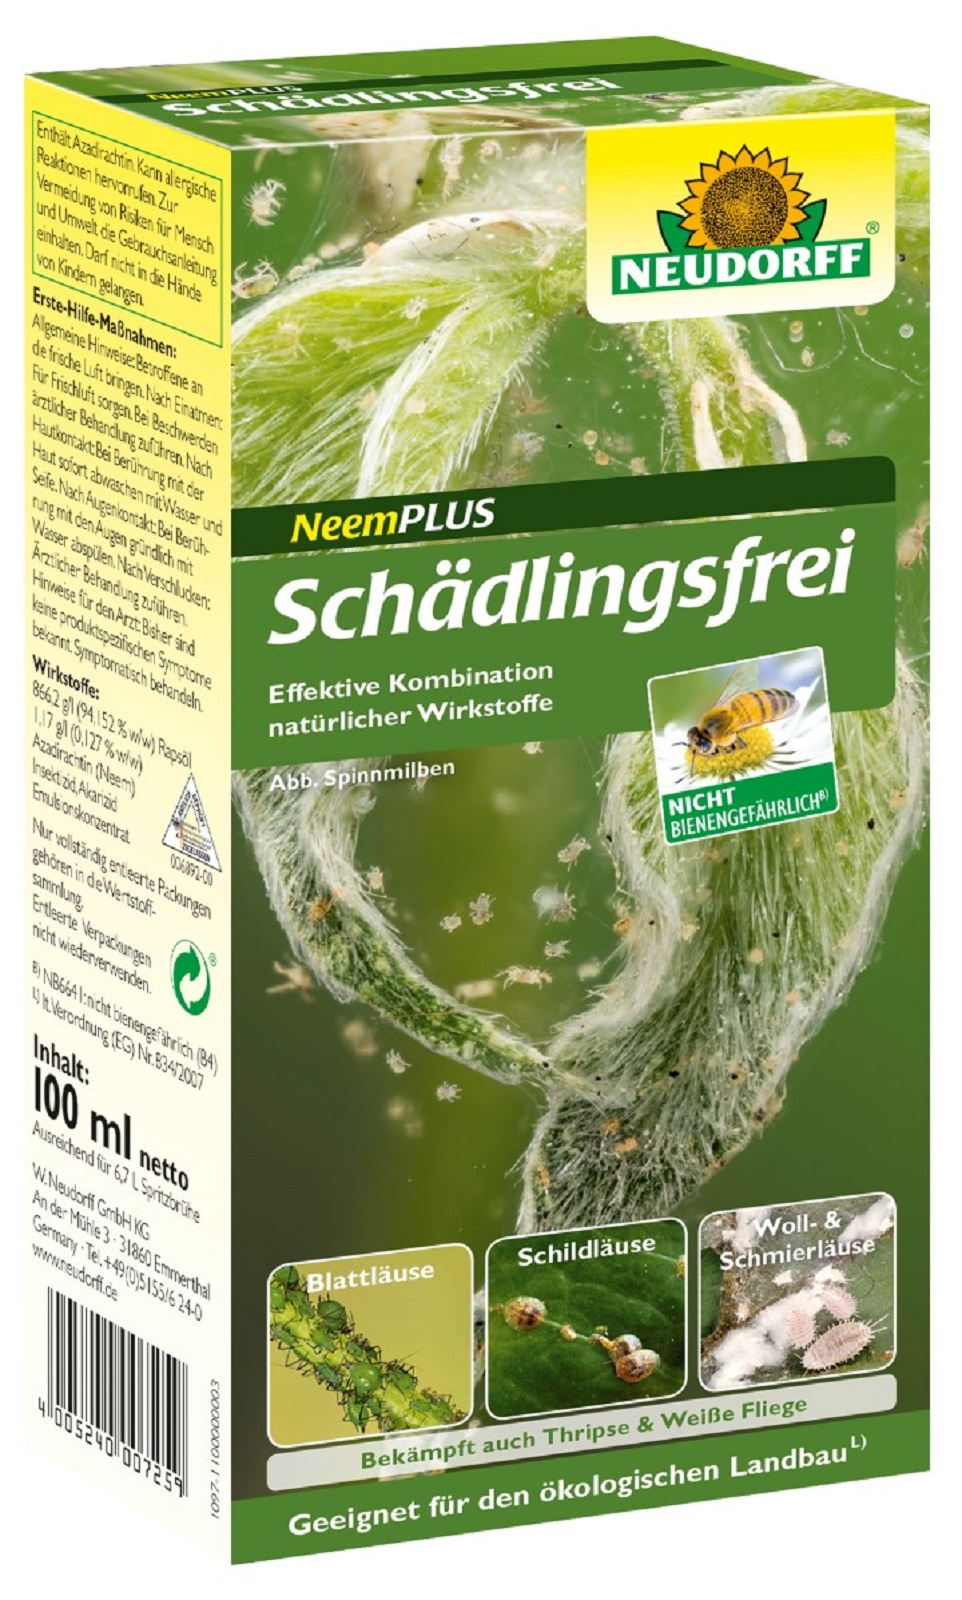 Neem Plus Schädlingsfrei ND 100 ml  Schädlingsbekämpfung Blattläuse Schildläuse